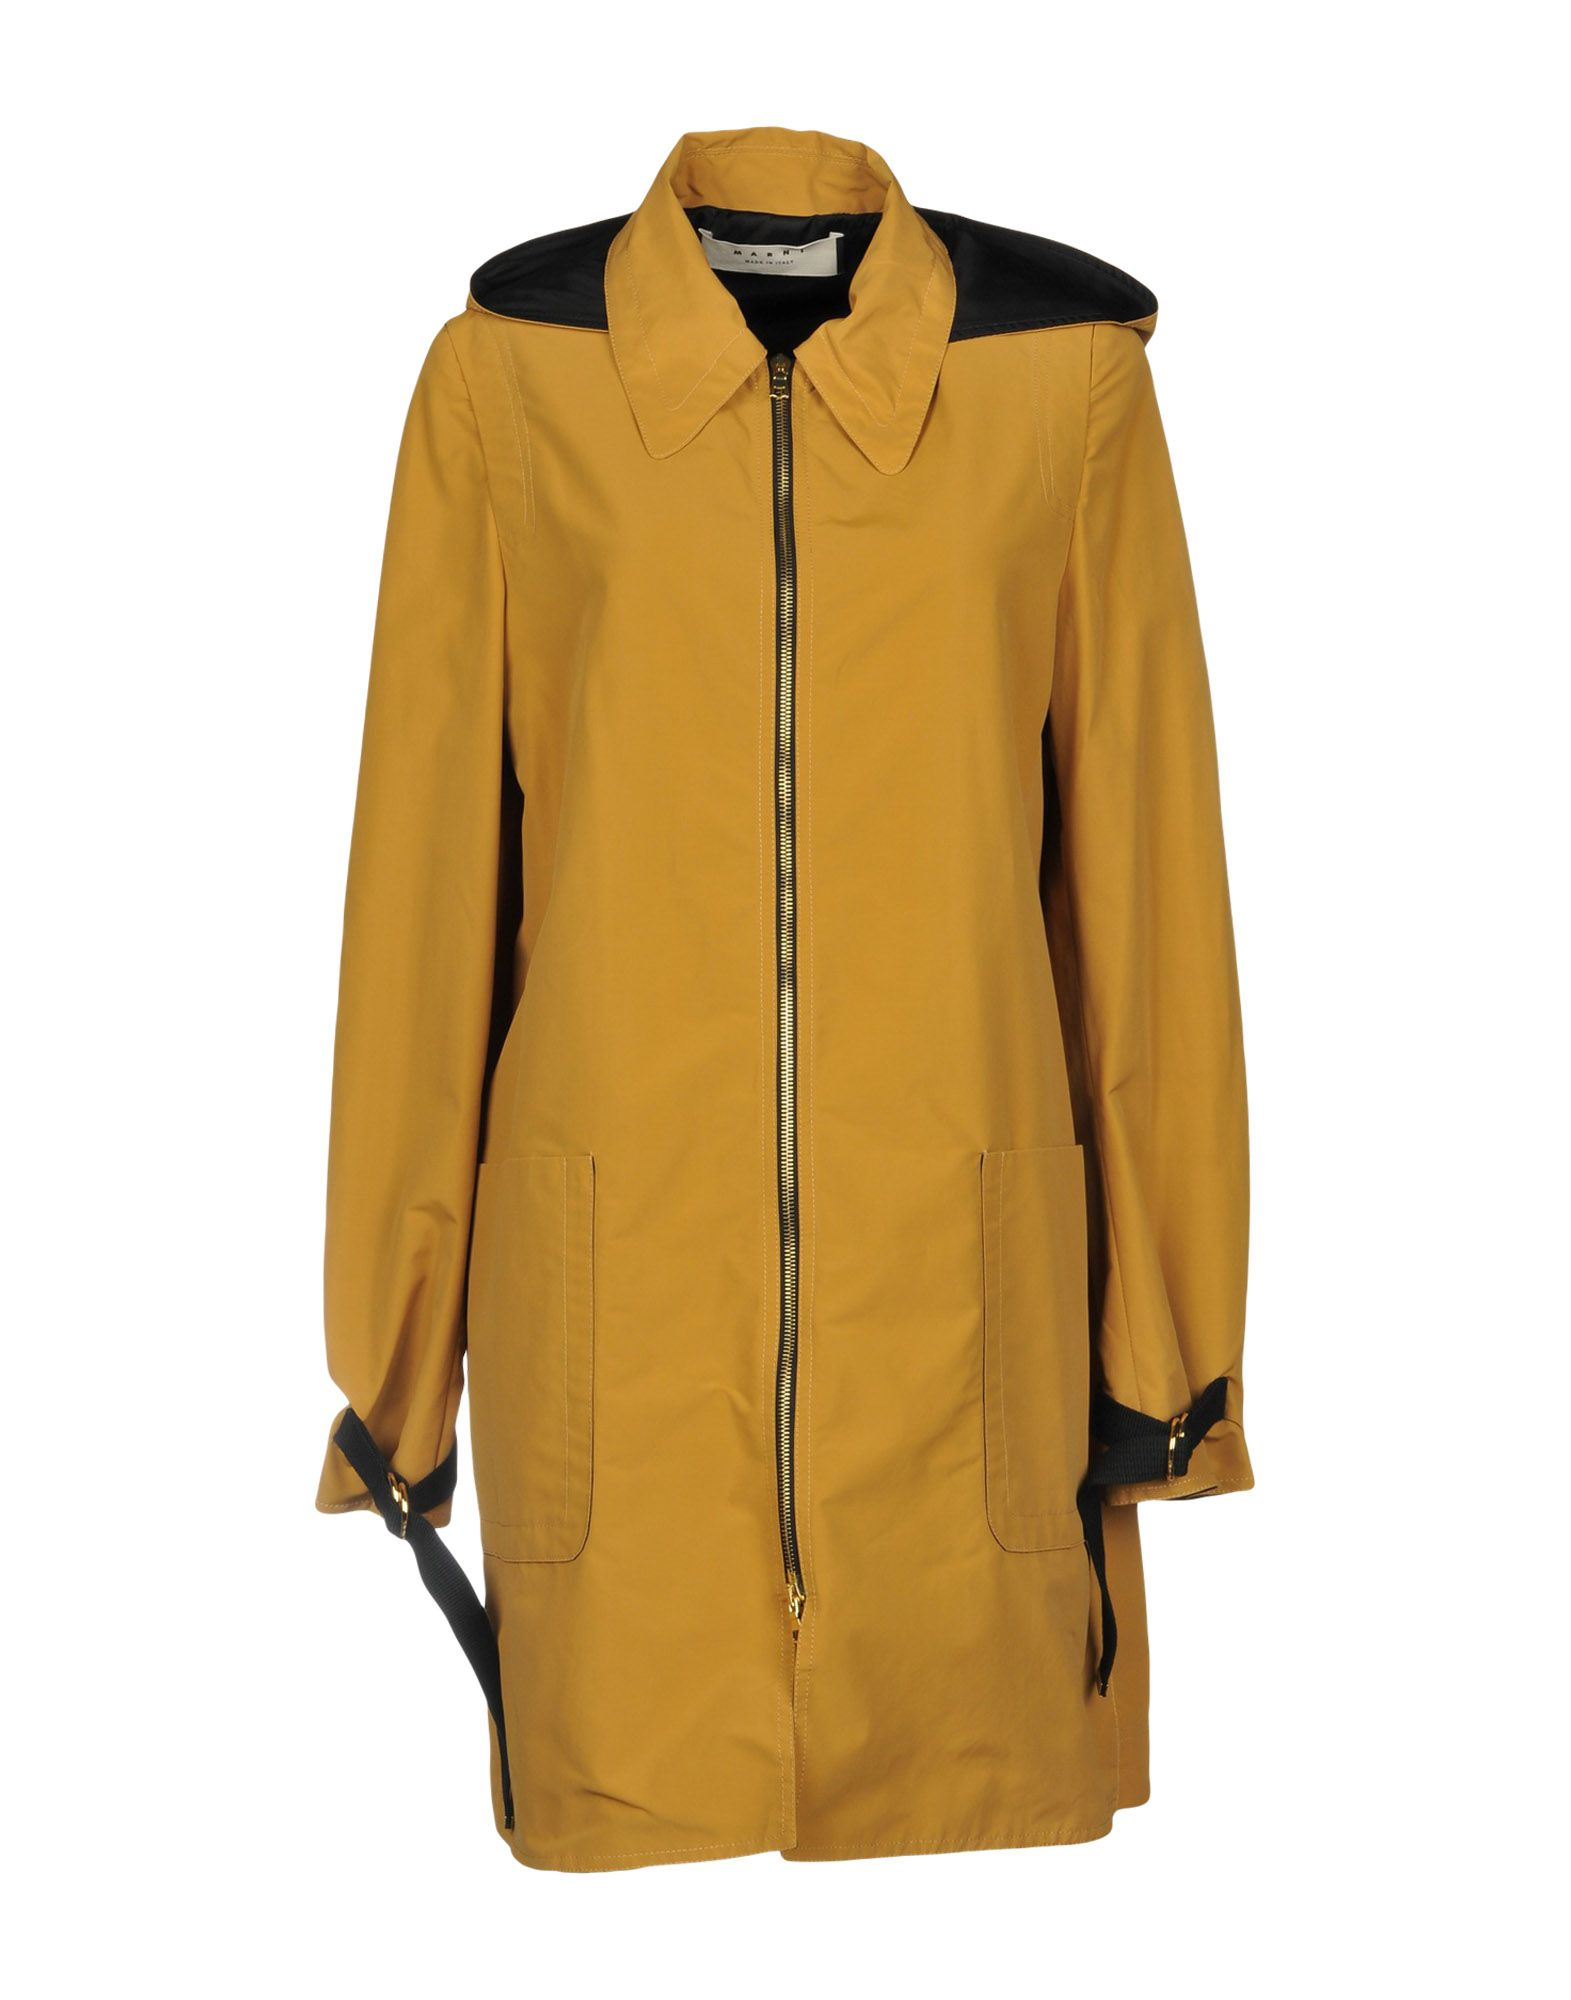 Marni Coats   Jackets - Marni Women - YOOX United States 36b2004448